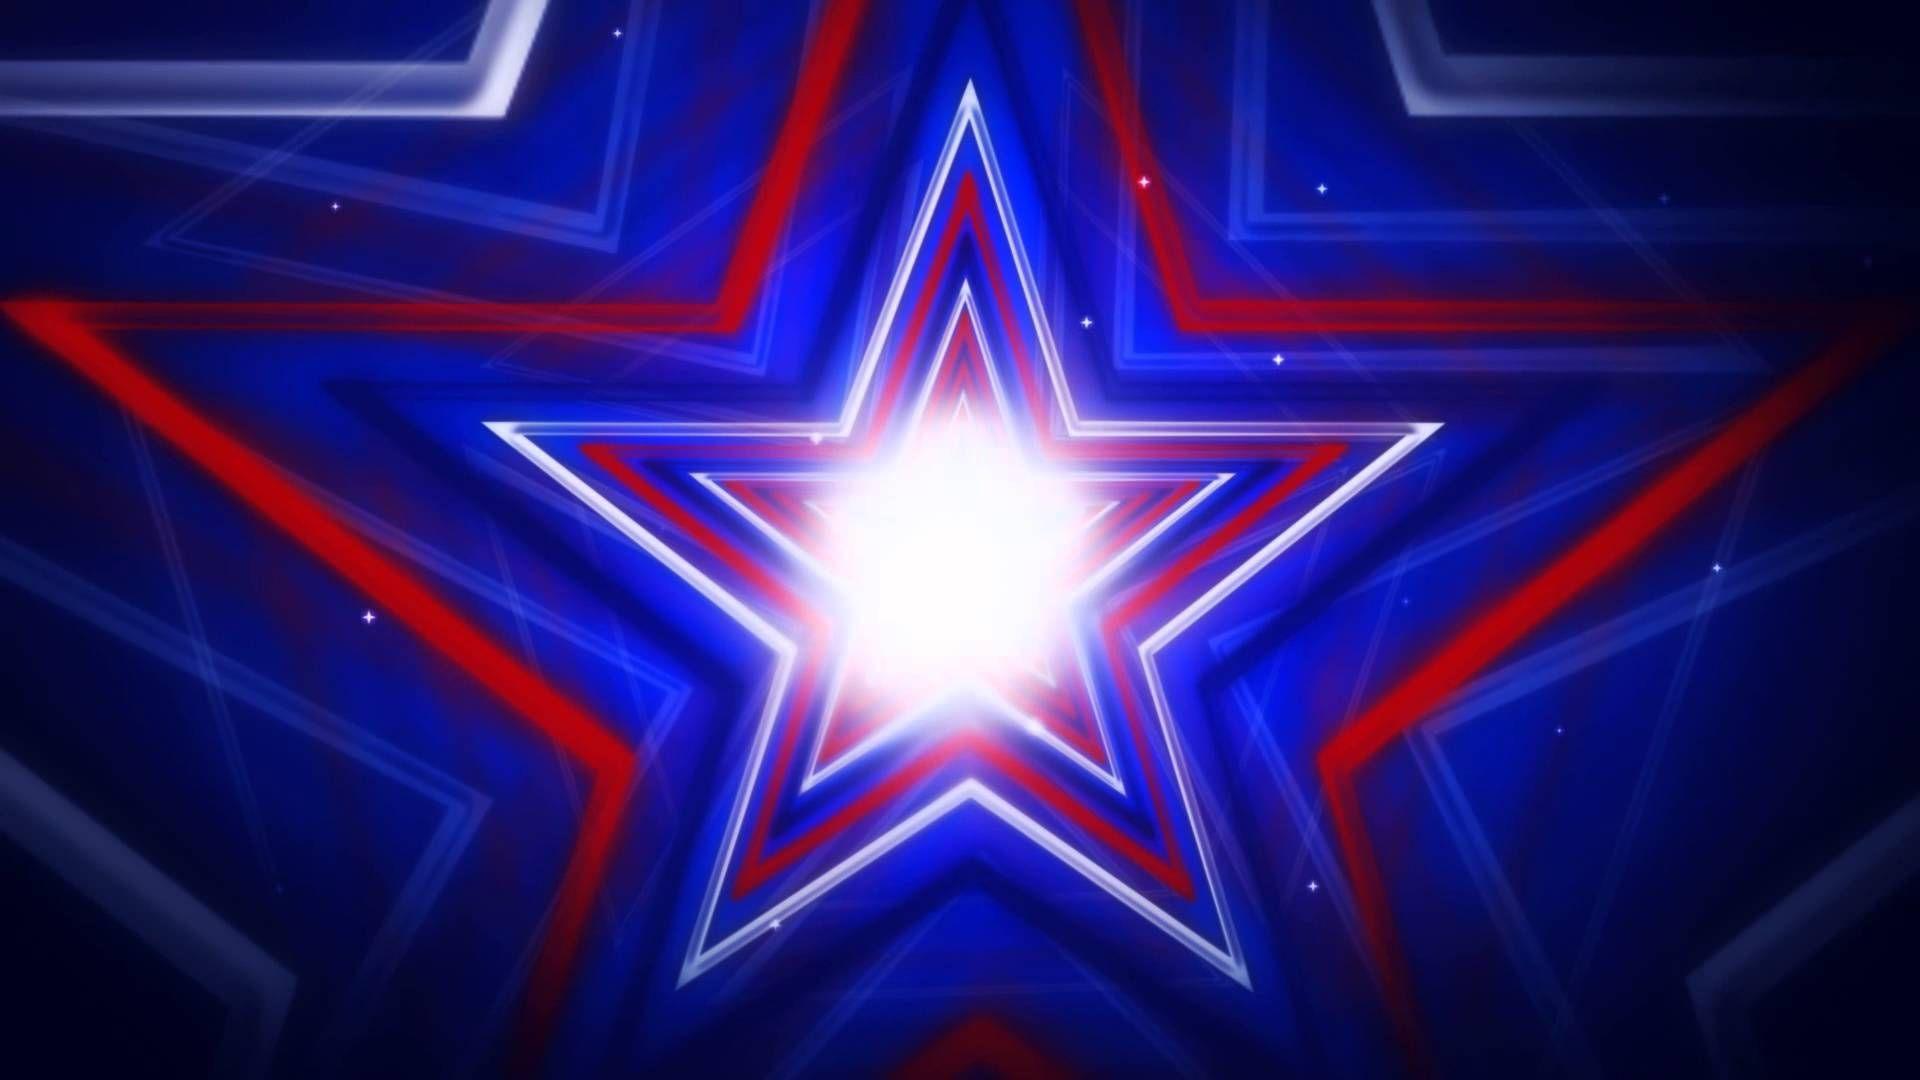 Fondos Animados Super Estrella Full HD Animated Background